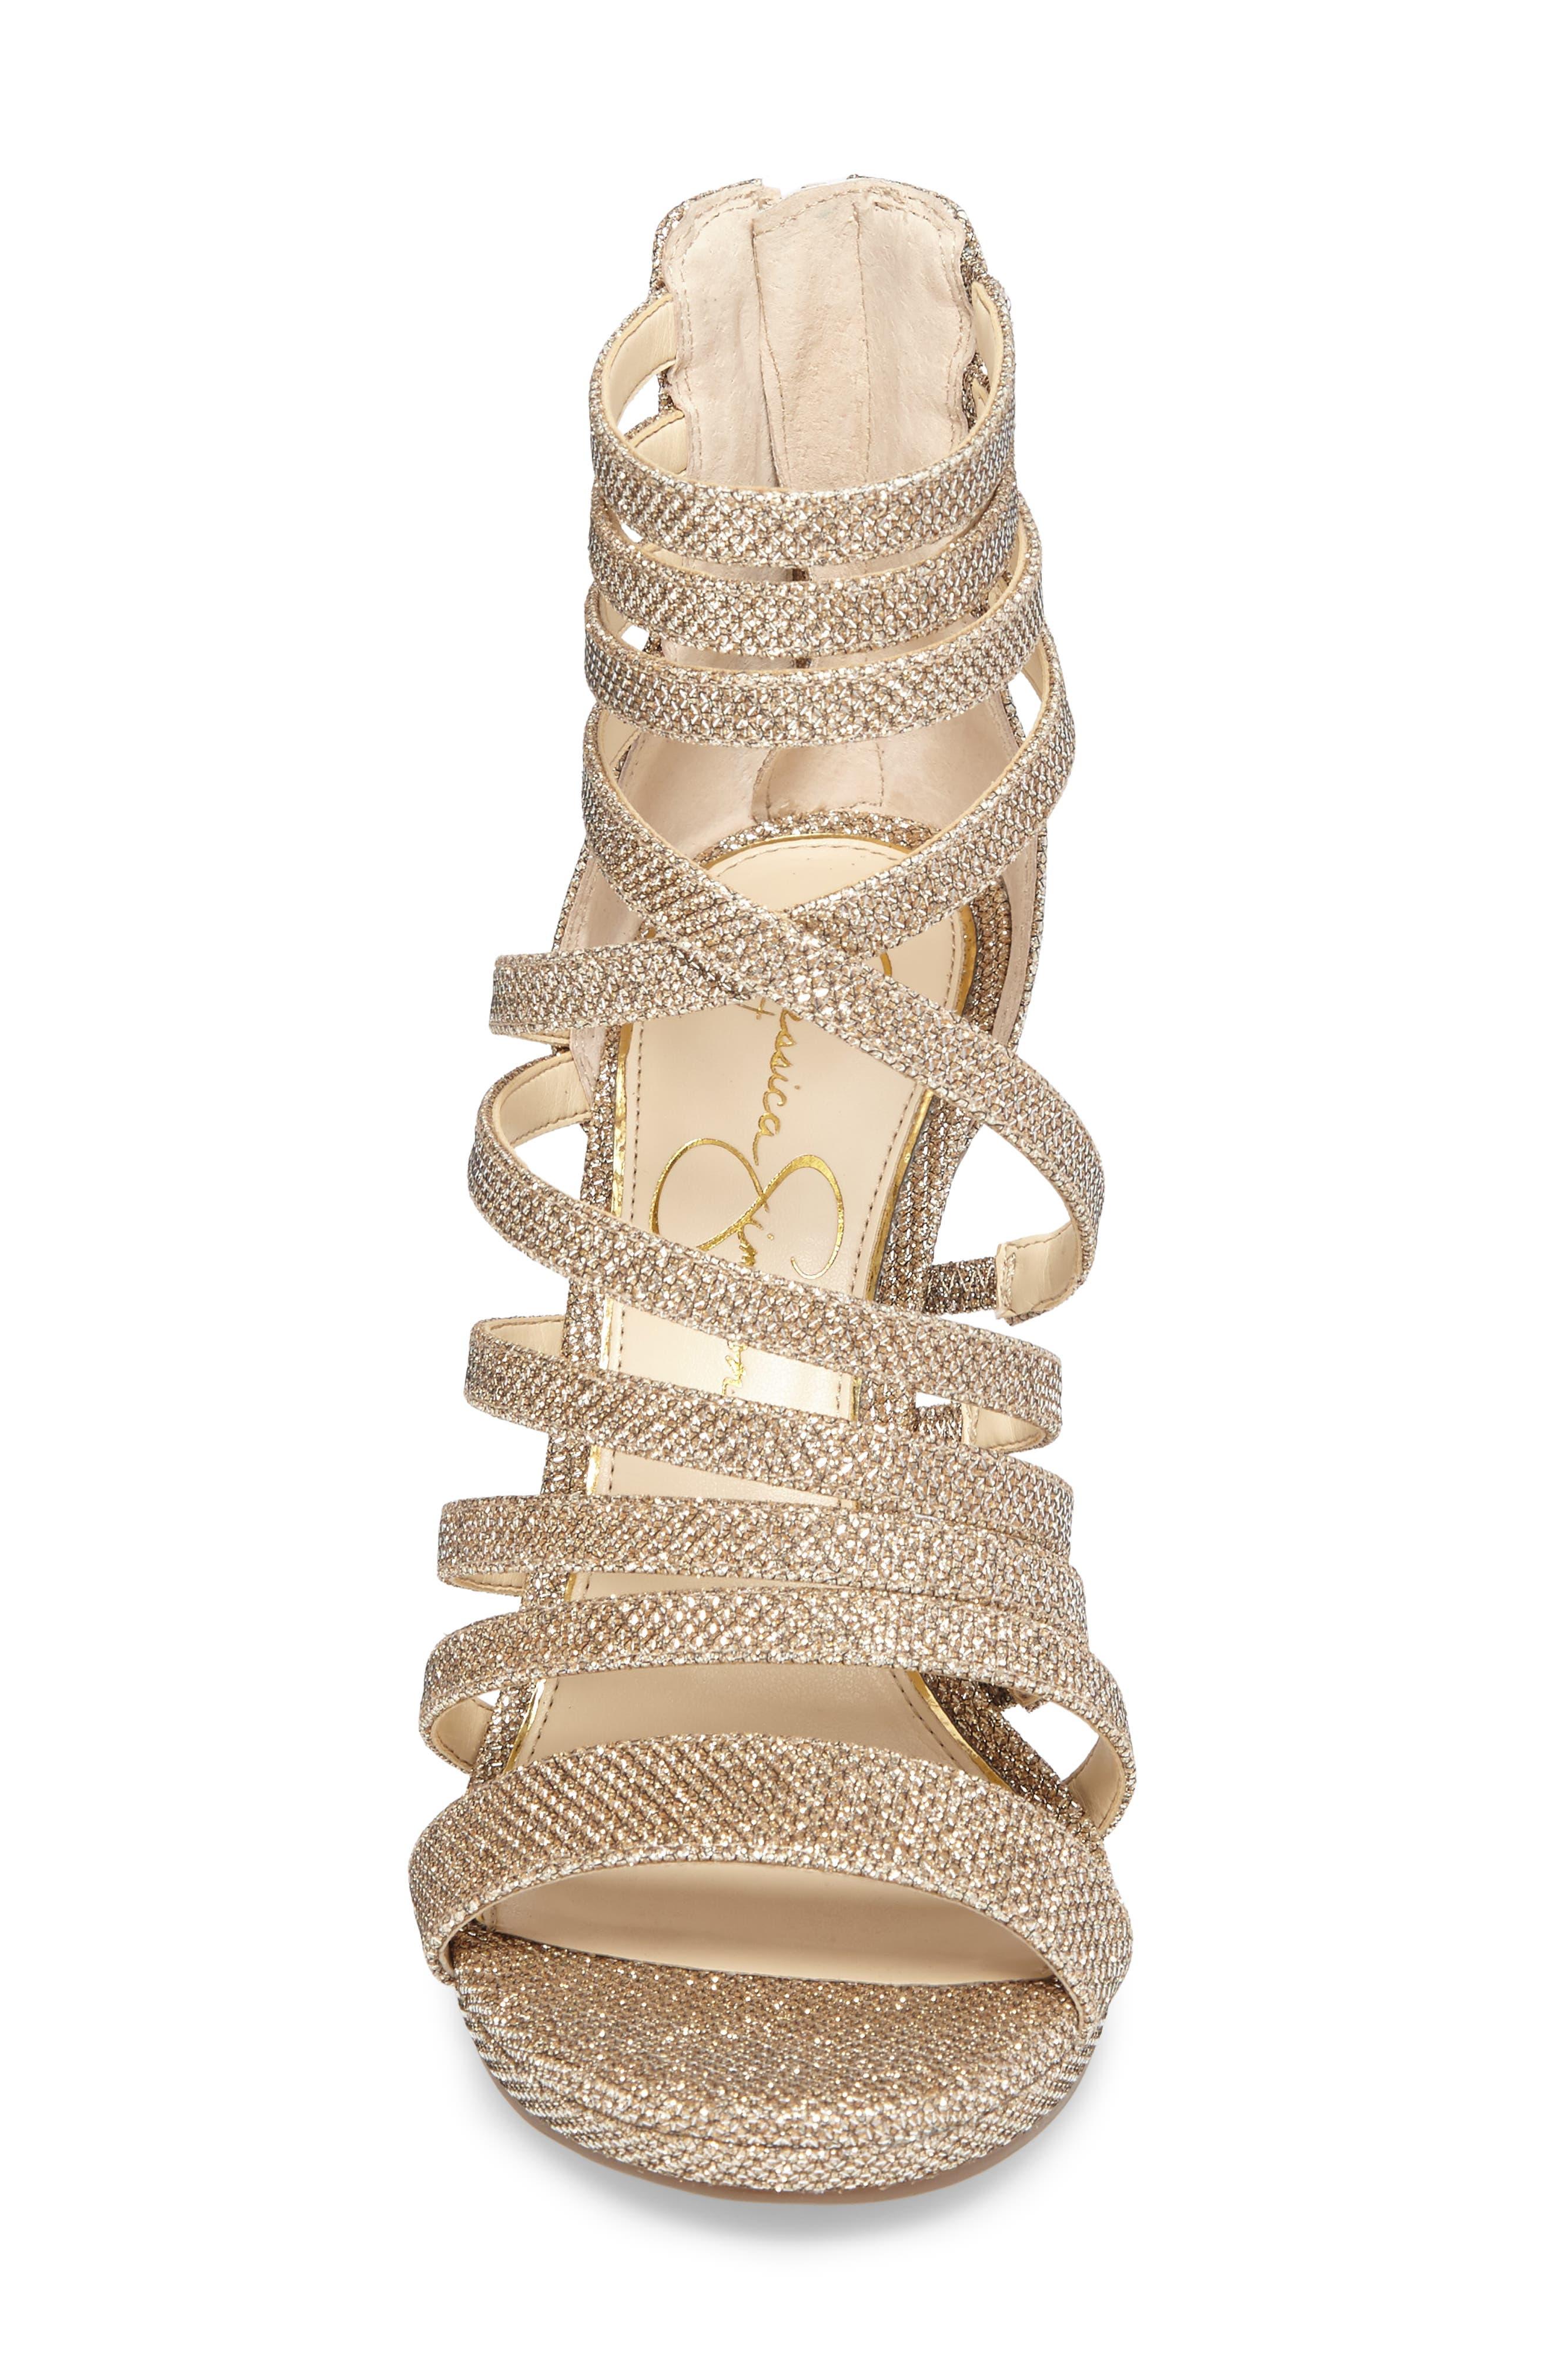 Palkaya Strappy Sandal,                             Alternate thumbnail 4, color,                             Gold Sparkle Mesh